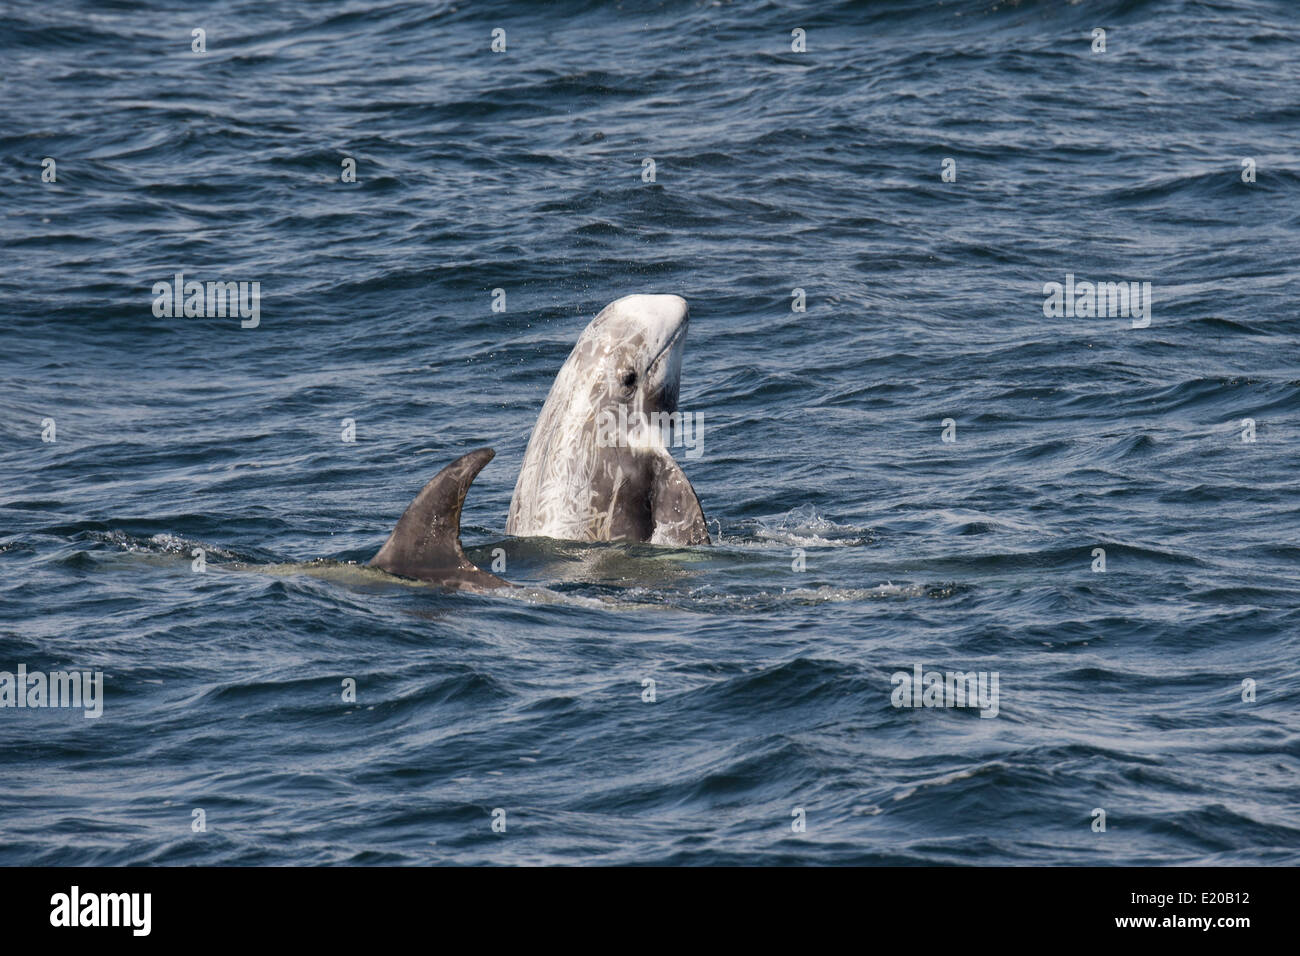 Risso's Dolphin (Grampus griseus) spyhopping. Monterey, California, Pacific Ocean. - Stock Image